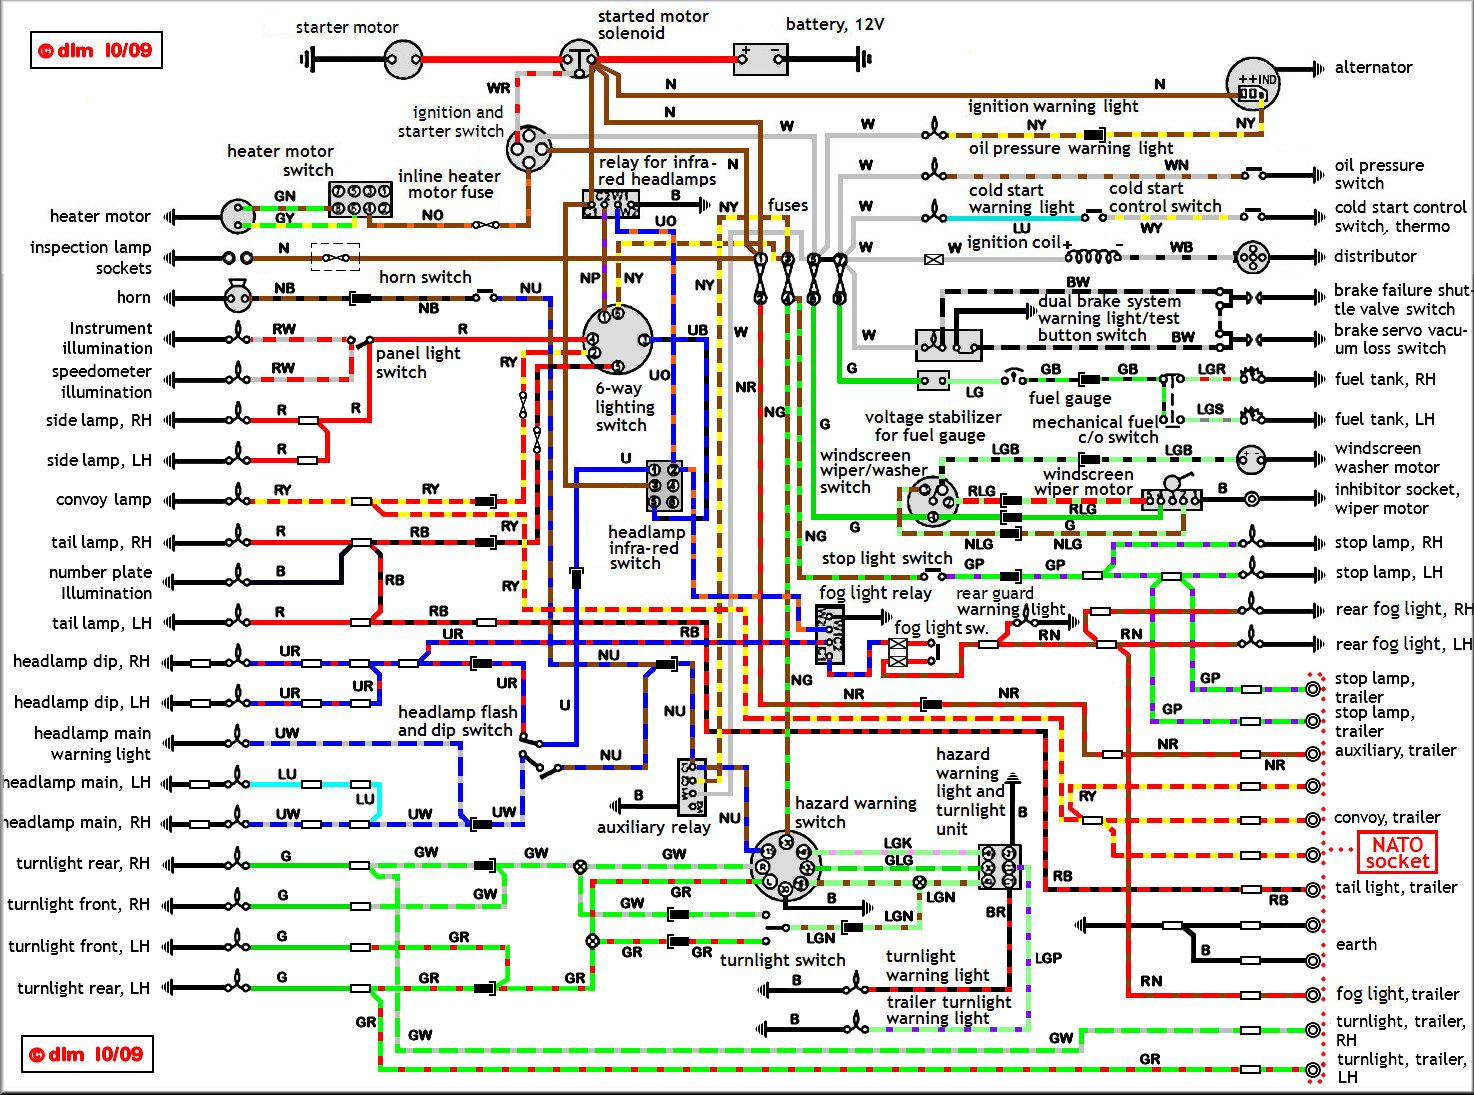 medium resolution of defender 90 wiring diagram electrical drawing wiring diagram u2022 defy ovens wiring diagrams land rover